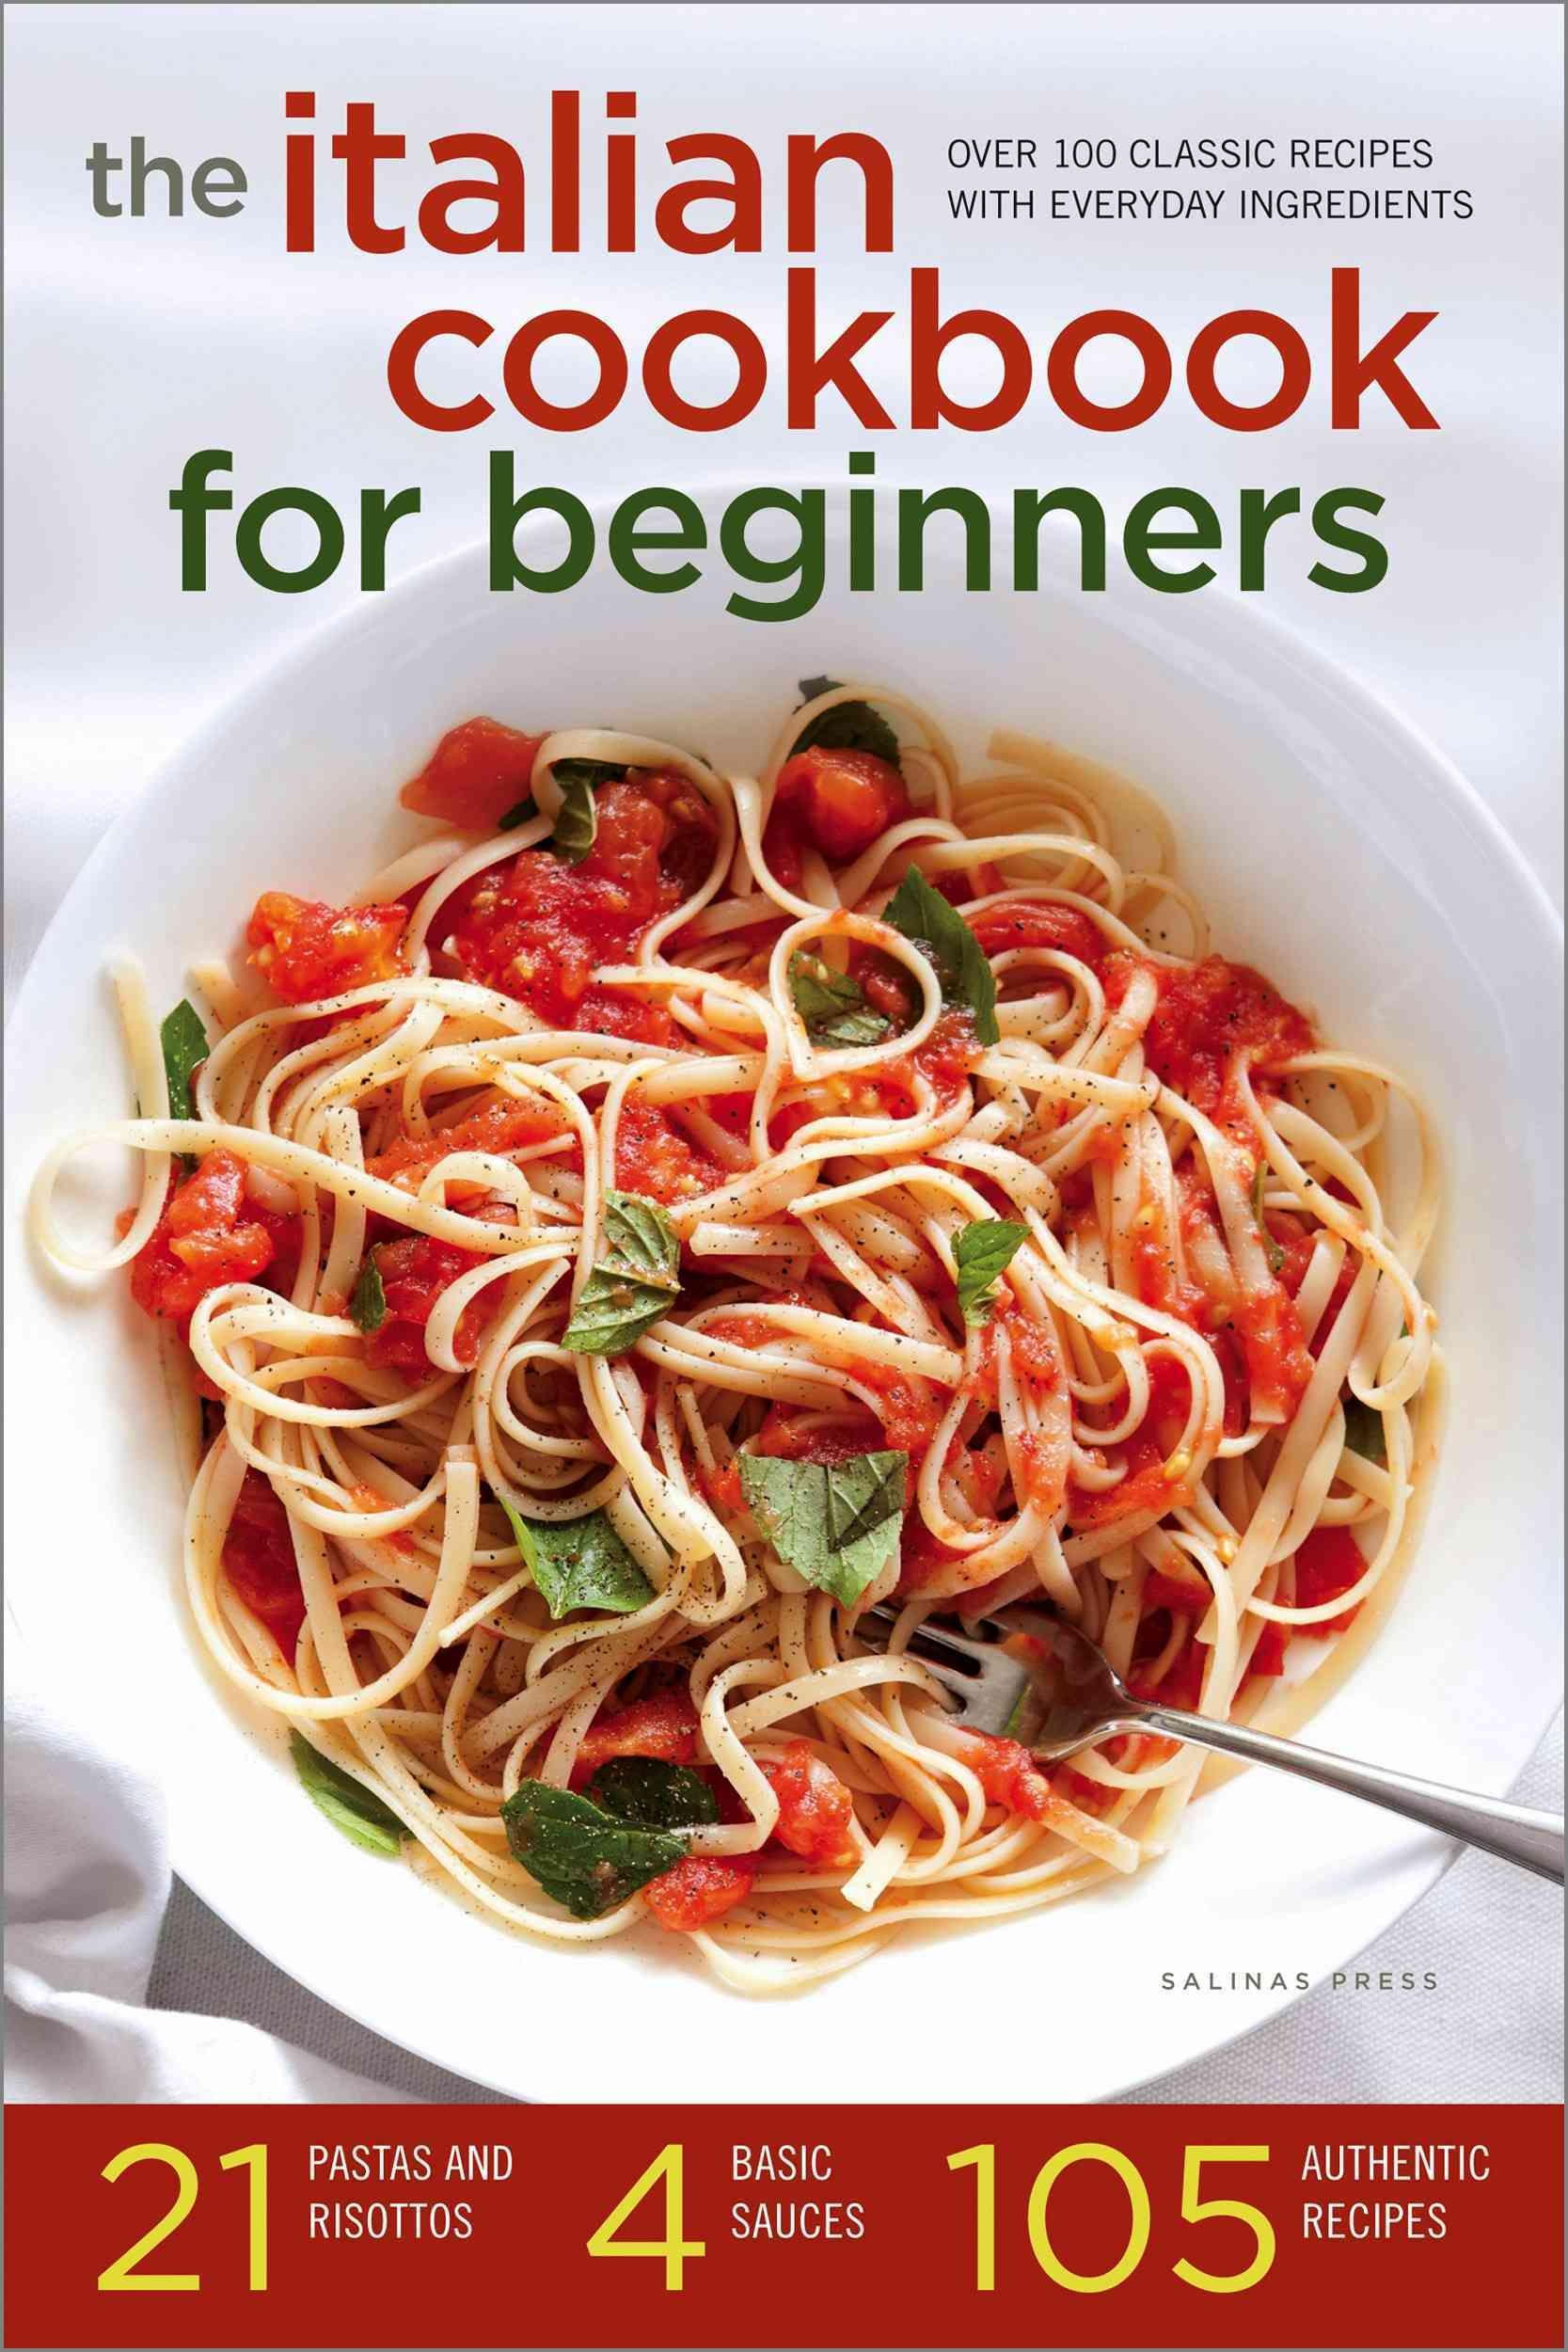 Italian Food Is The Ultimate Comforting Homemade Cuisine